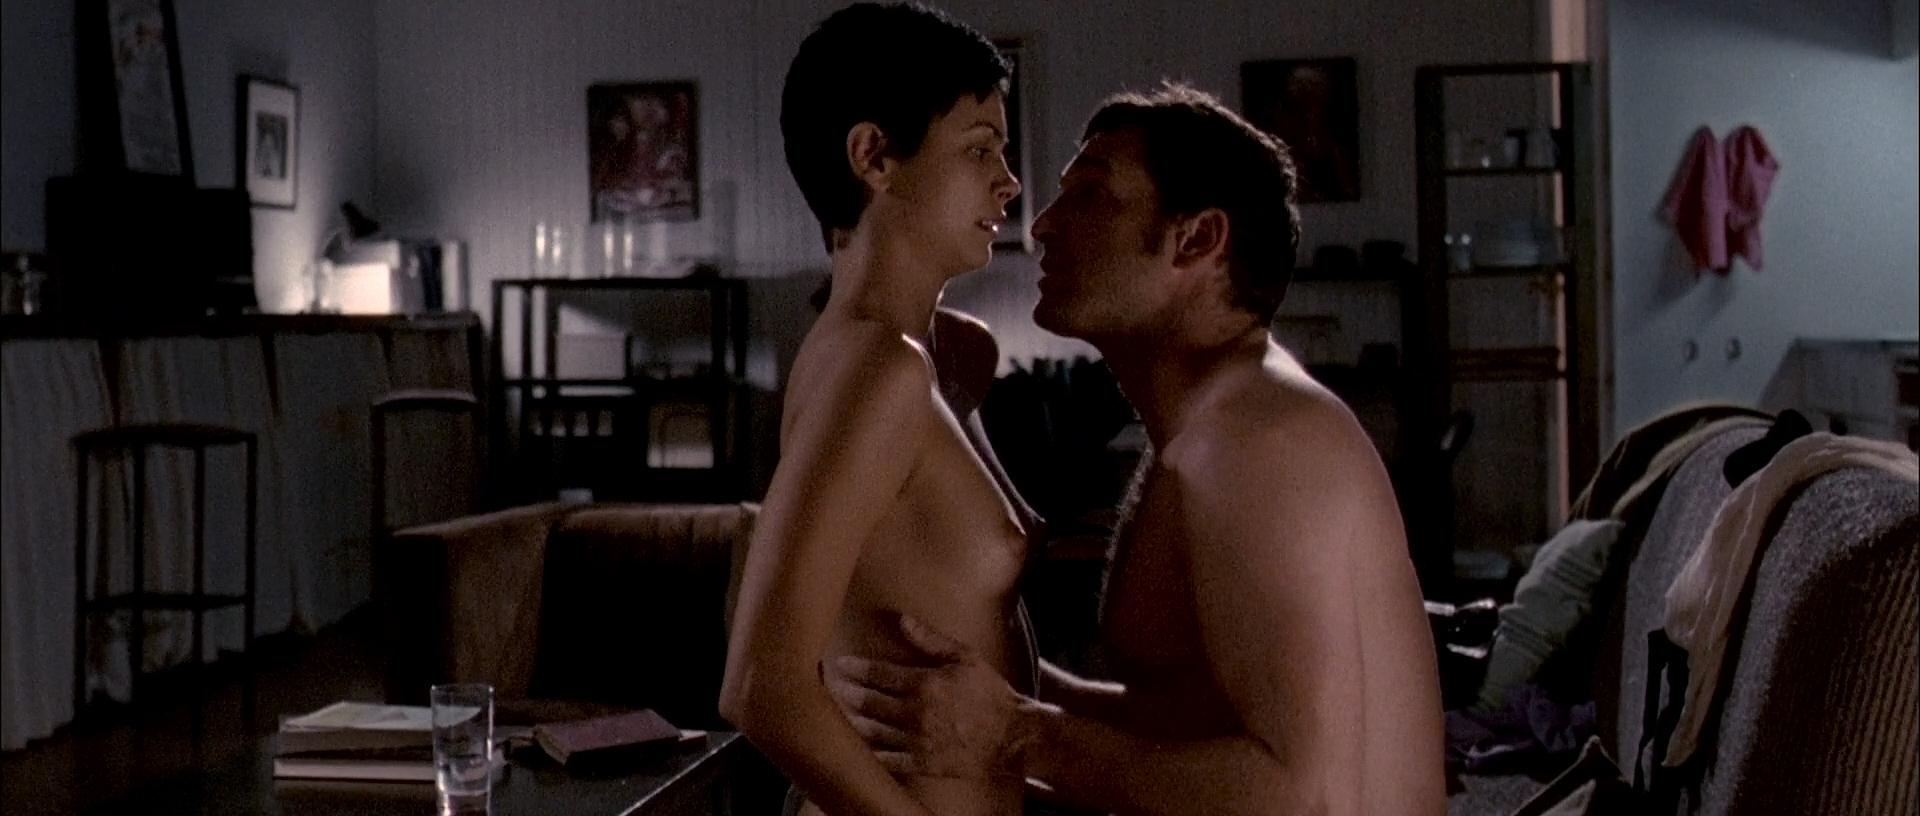 Morena Baccarin nude topless, Vanessa Kai nude sex - Death in Love (2008) hd 1080p Bluray (12)